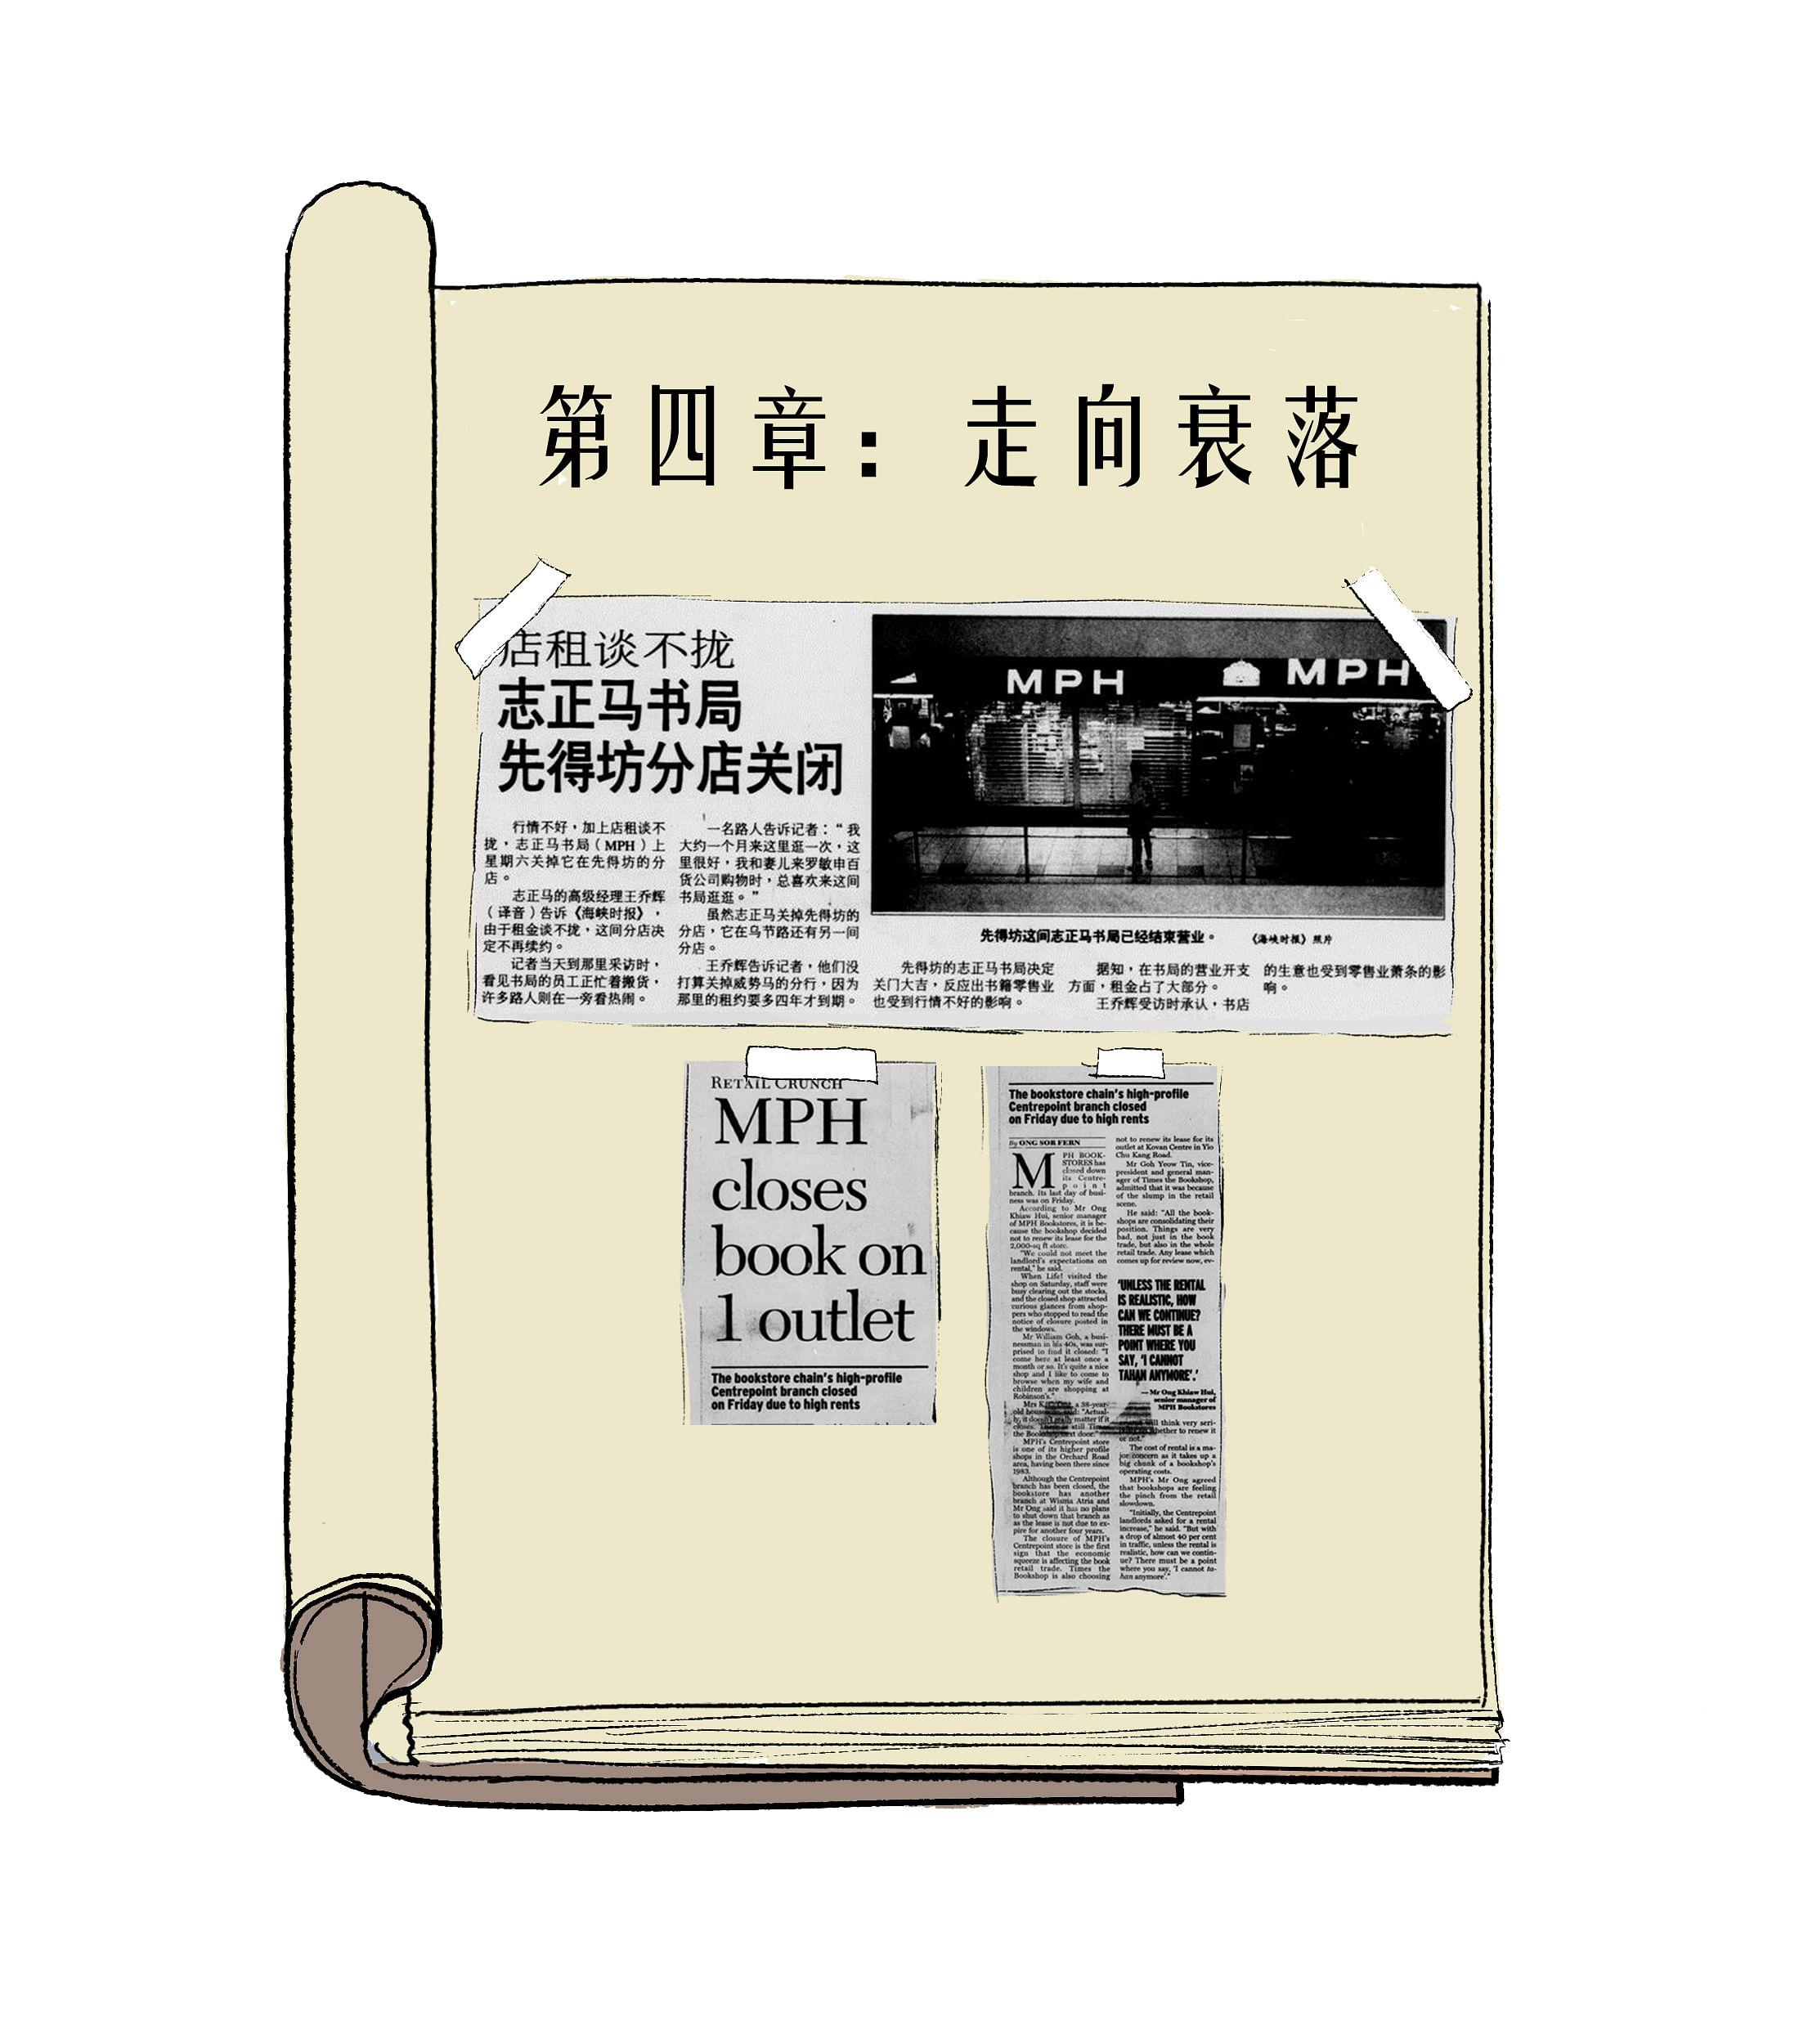 20190712_singapore_mph-bookstore-closing-05-mobile.jpg